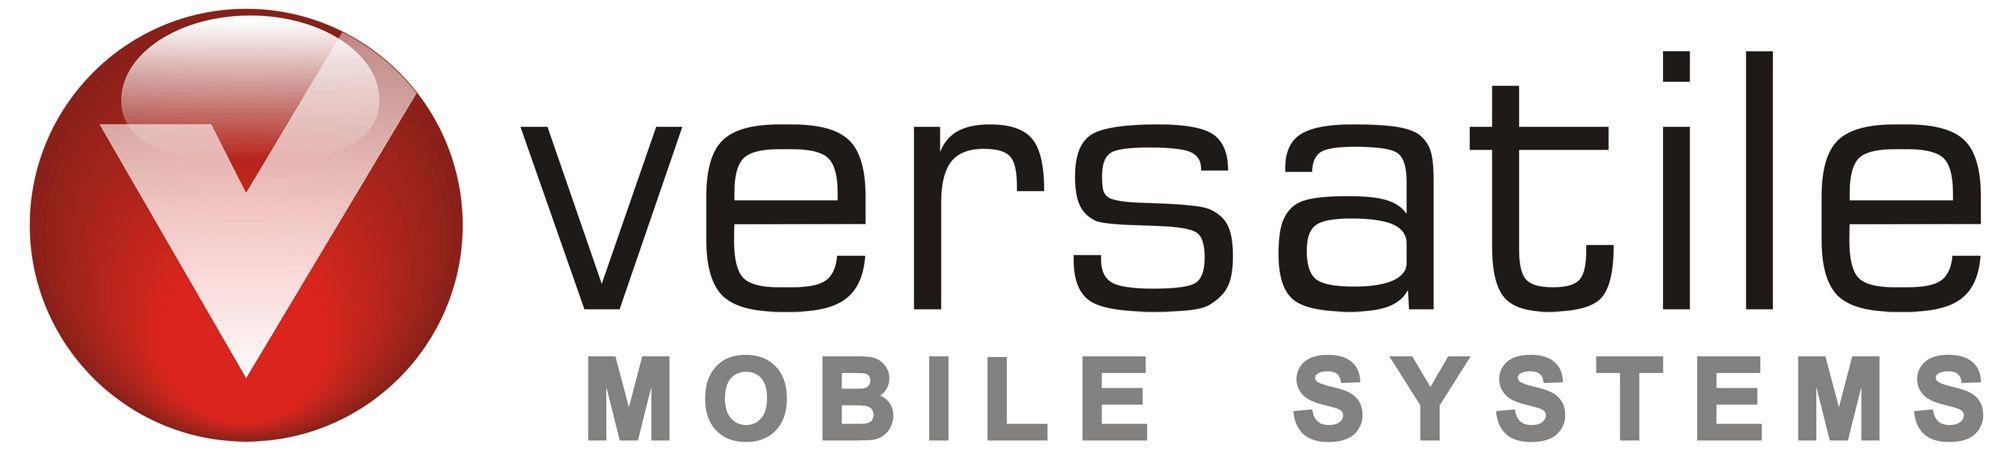 Versatile Mobile Systems, Inc